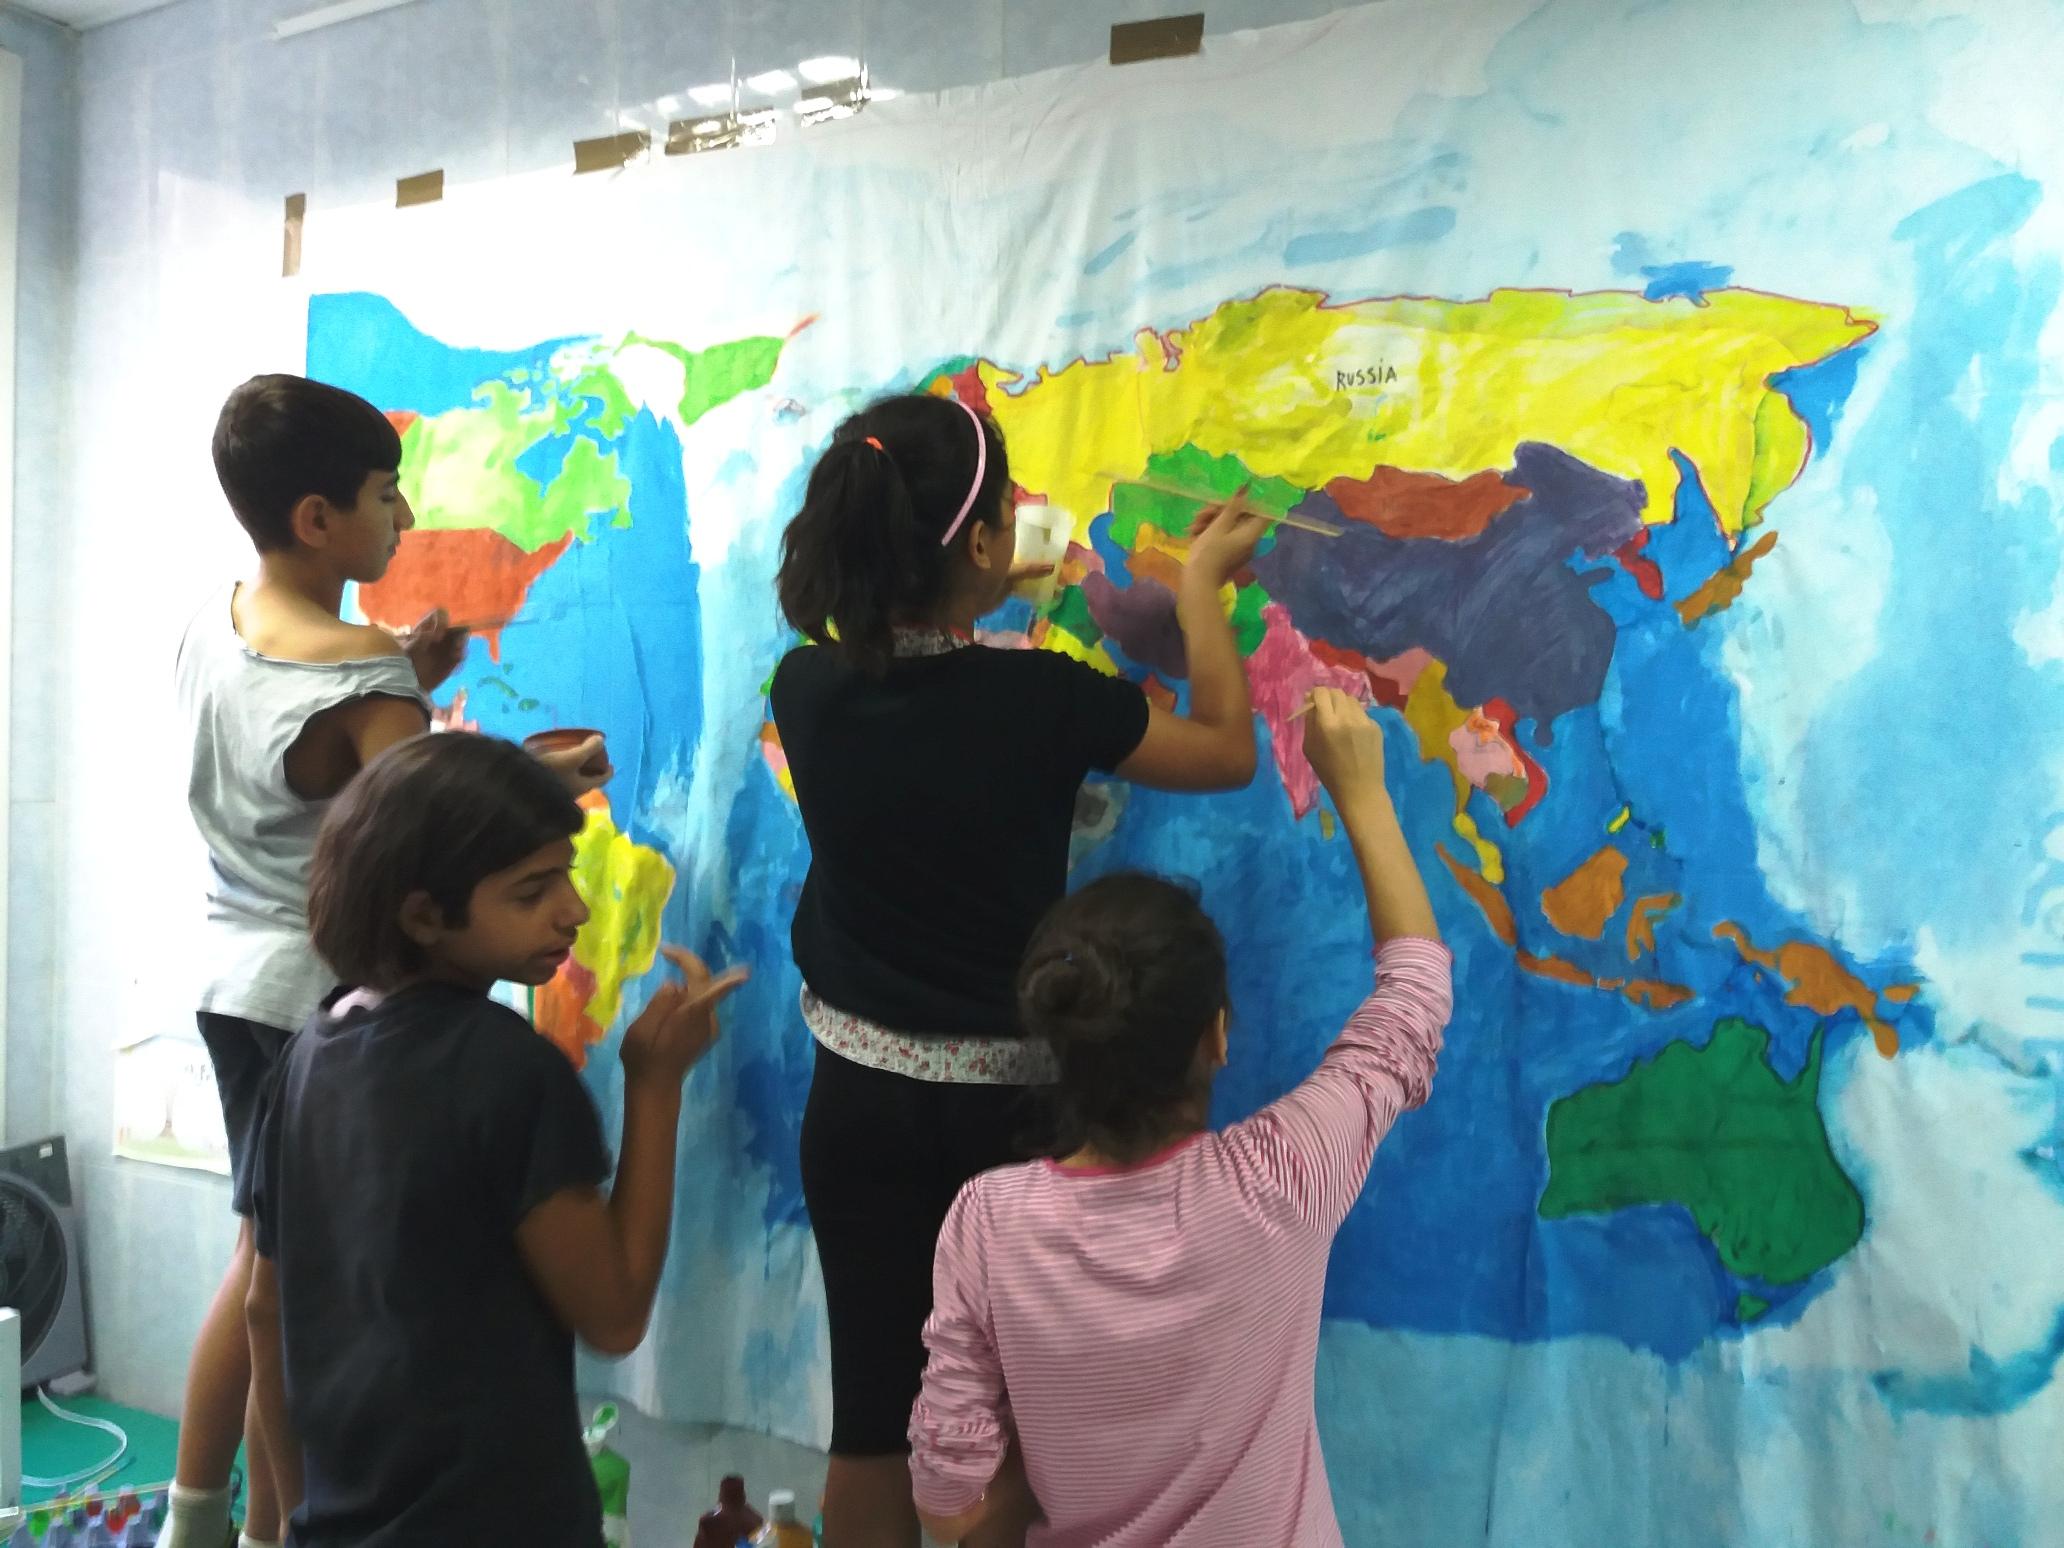 WELCOMMON, όχι μόνο κέντρο φιλοξενίας προσφύγων αλλά και στο επίκεντρο της ανταλλαγής εμπειριών